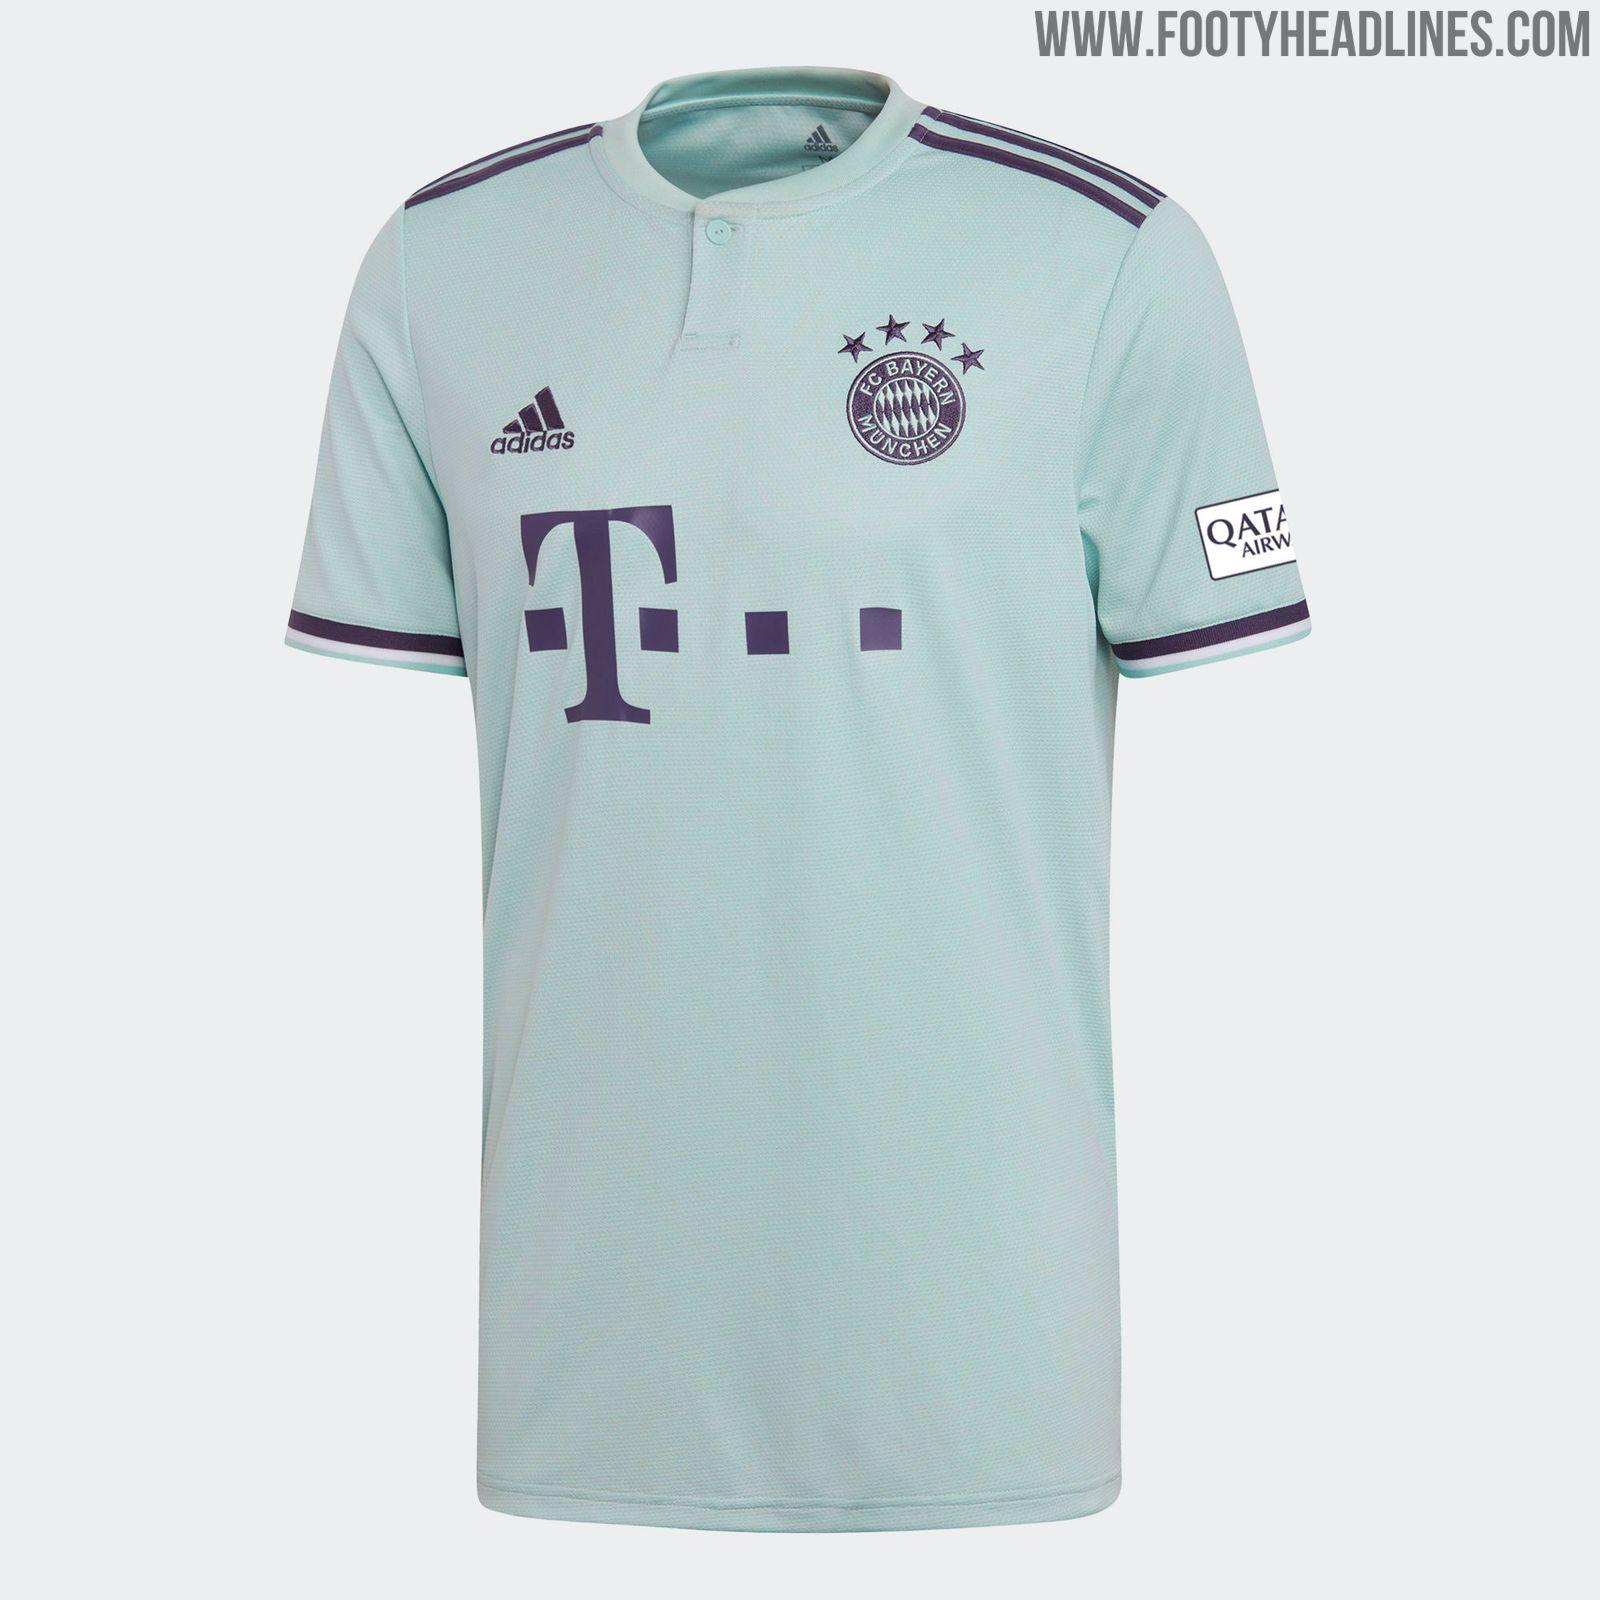 37e81bd5d The Adidas Bayern 18-19 away kit is mint green